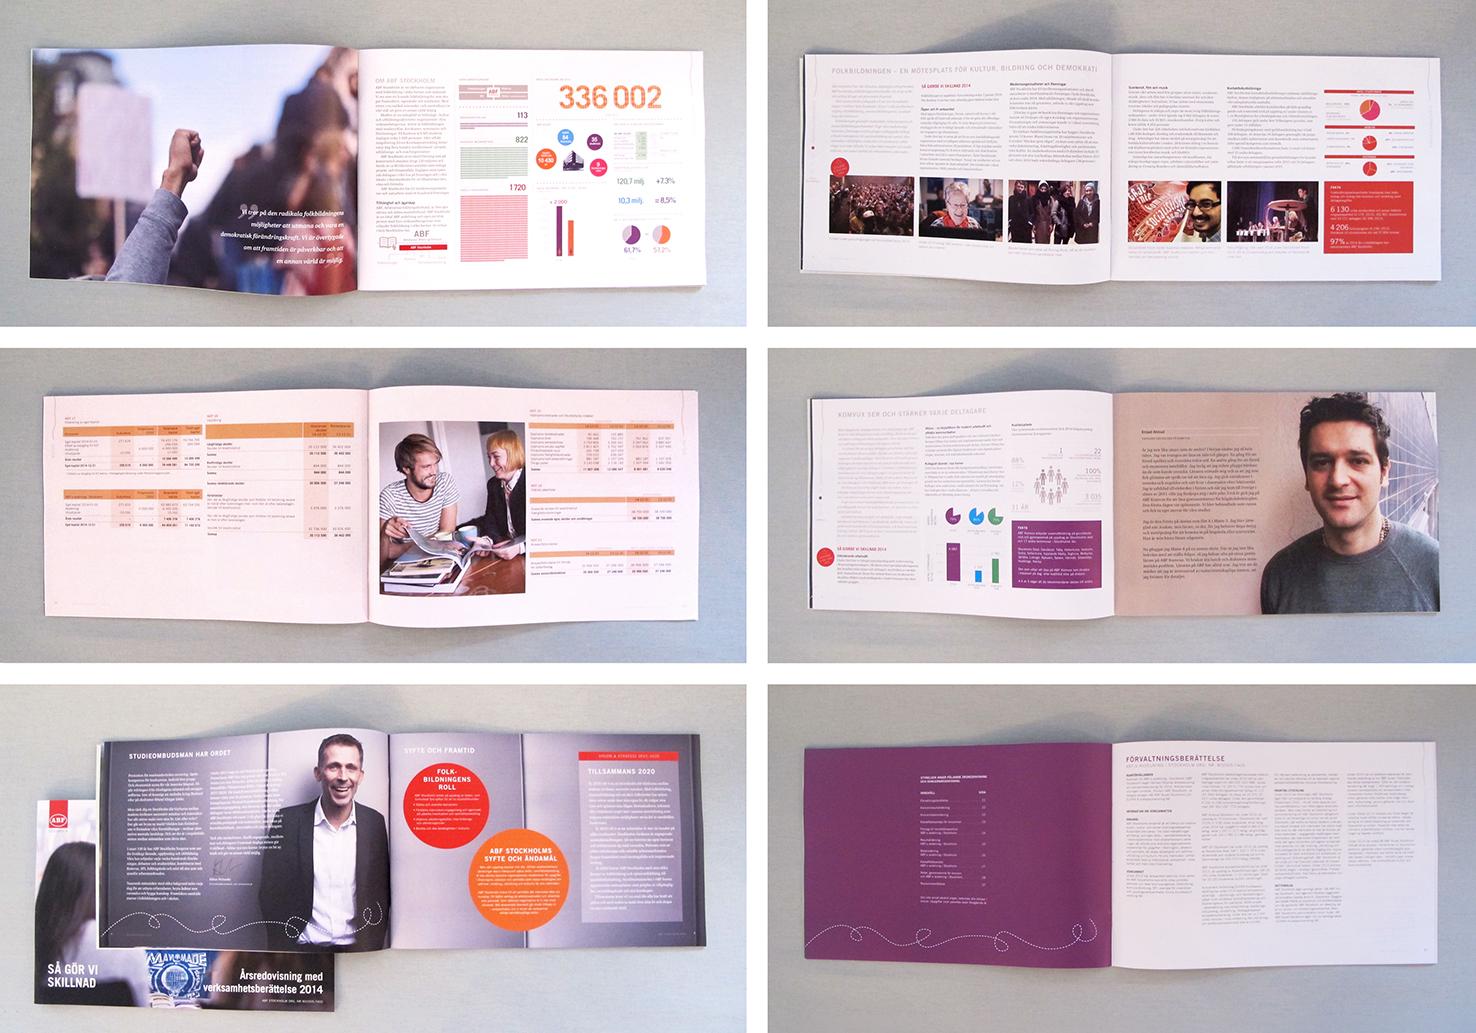 ABF årsredovisning collage